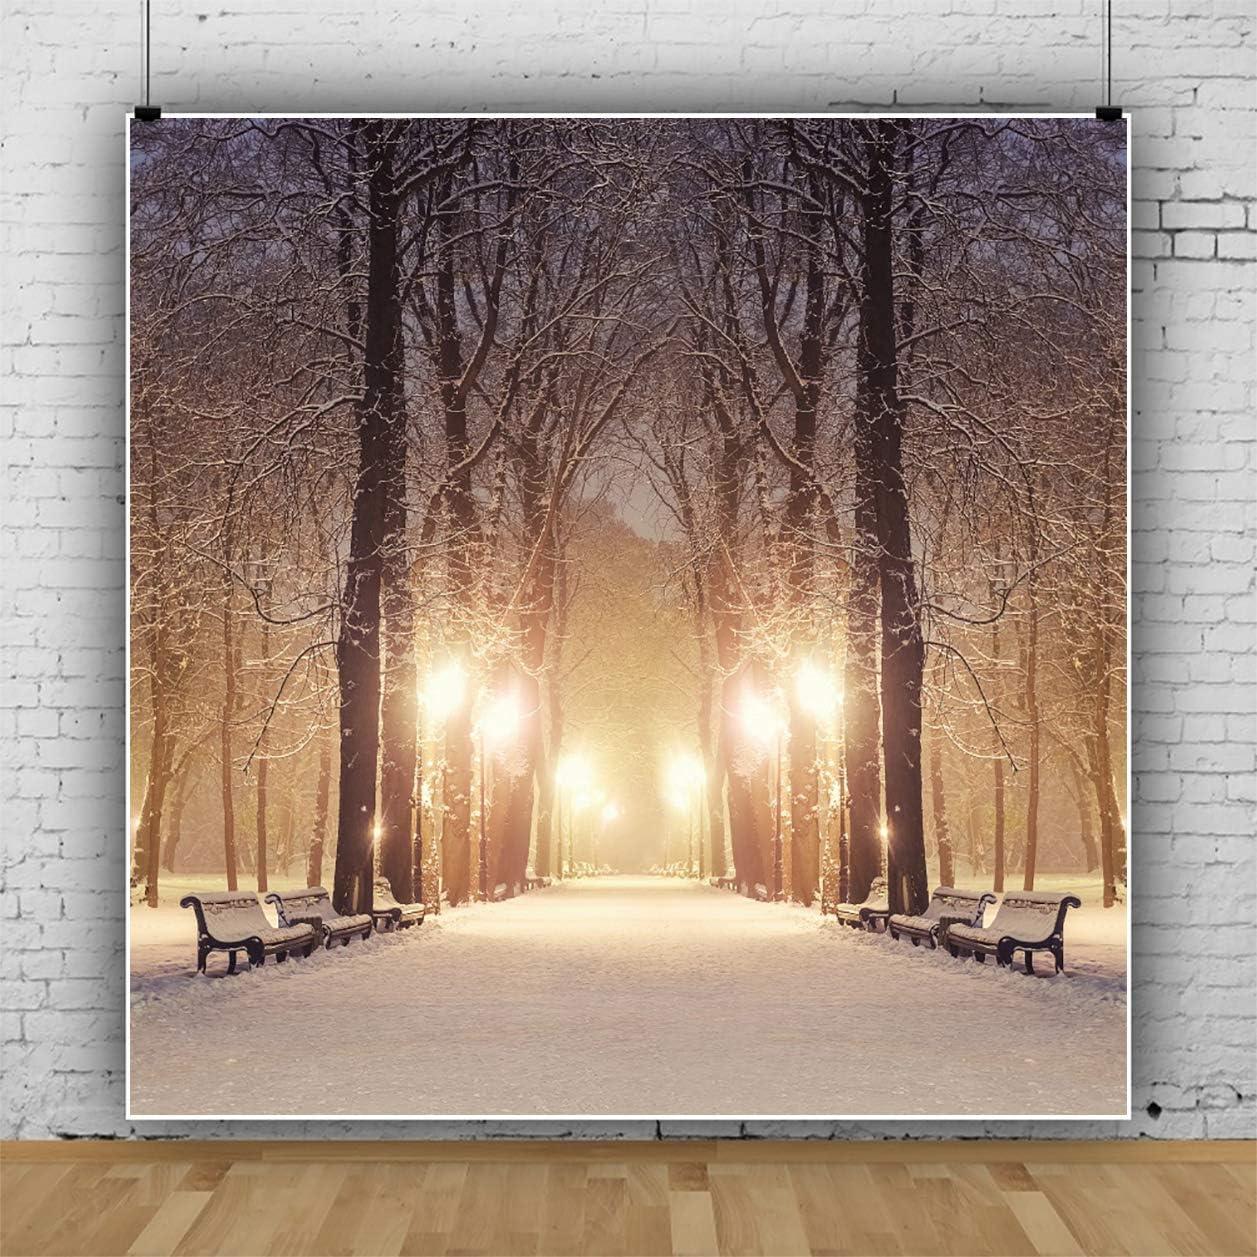 Yeele Winter Night Park Backdrop Snowy Bench Street Lamps Photography Background Kids Newborn Adults Artistic Portrait 10x10ft Work Event Wedding Photoshoot Banner Photo Booth Studio Video Wallpaper